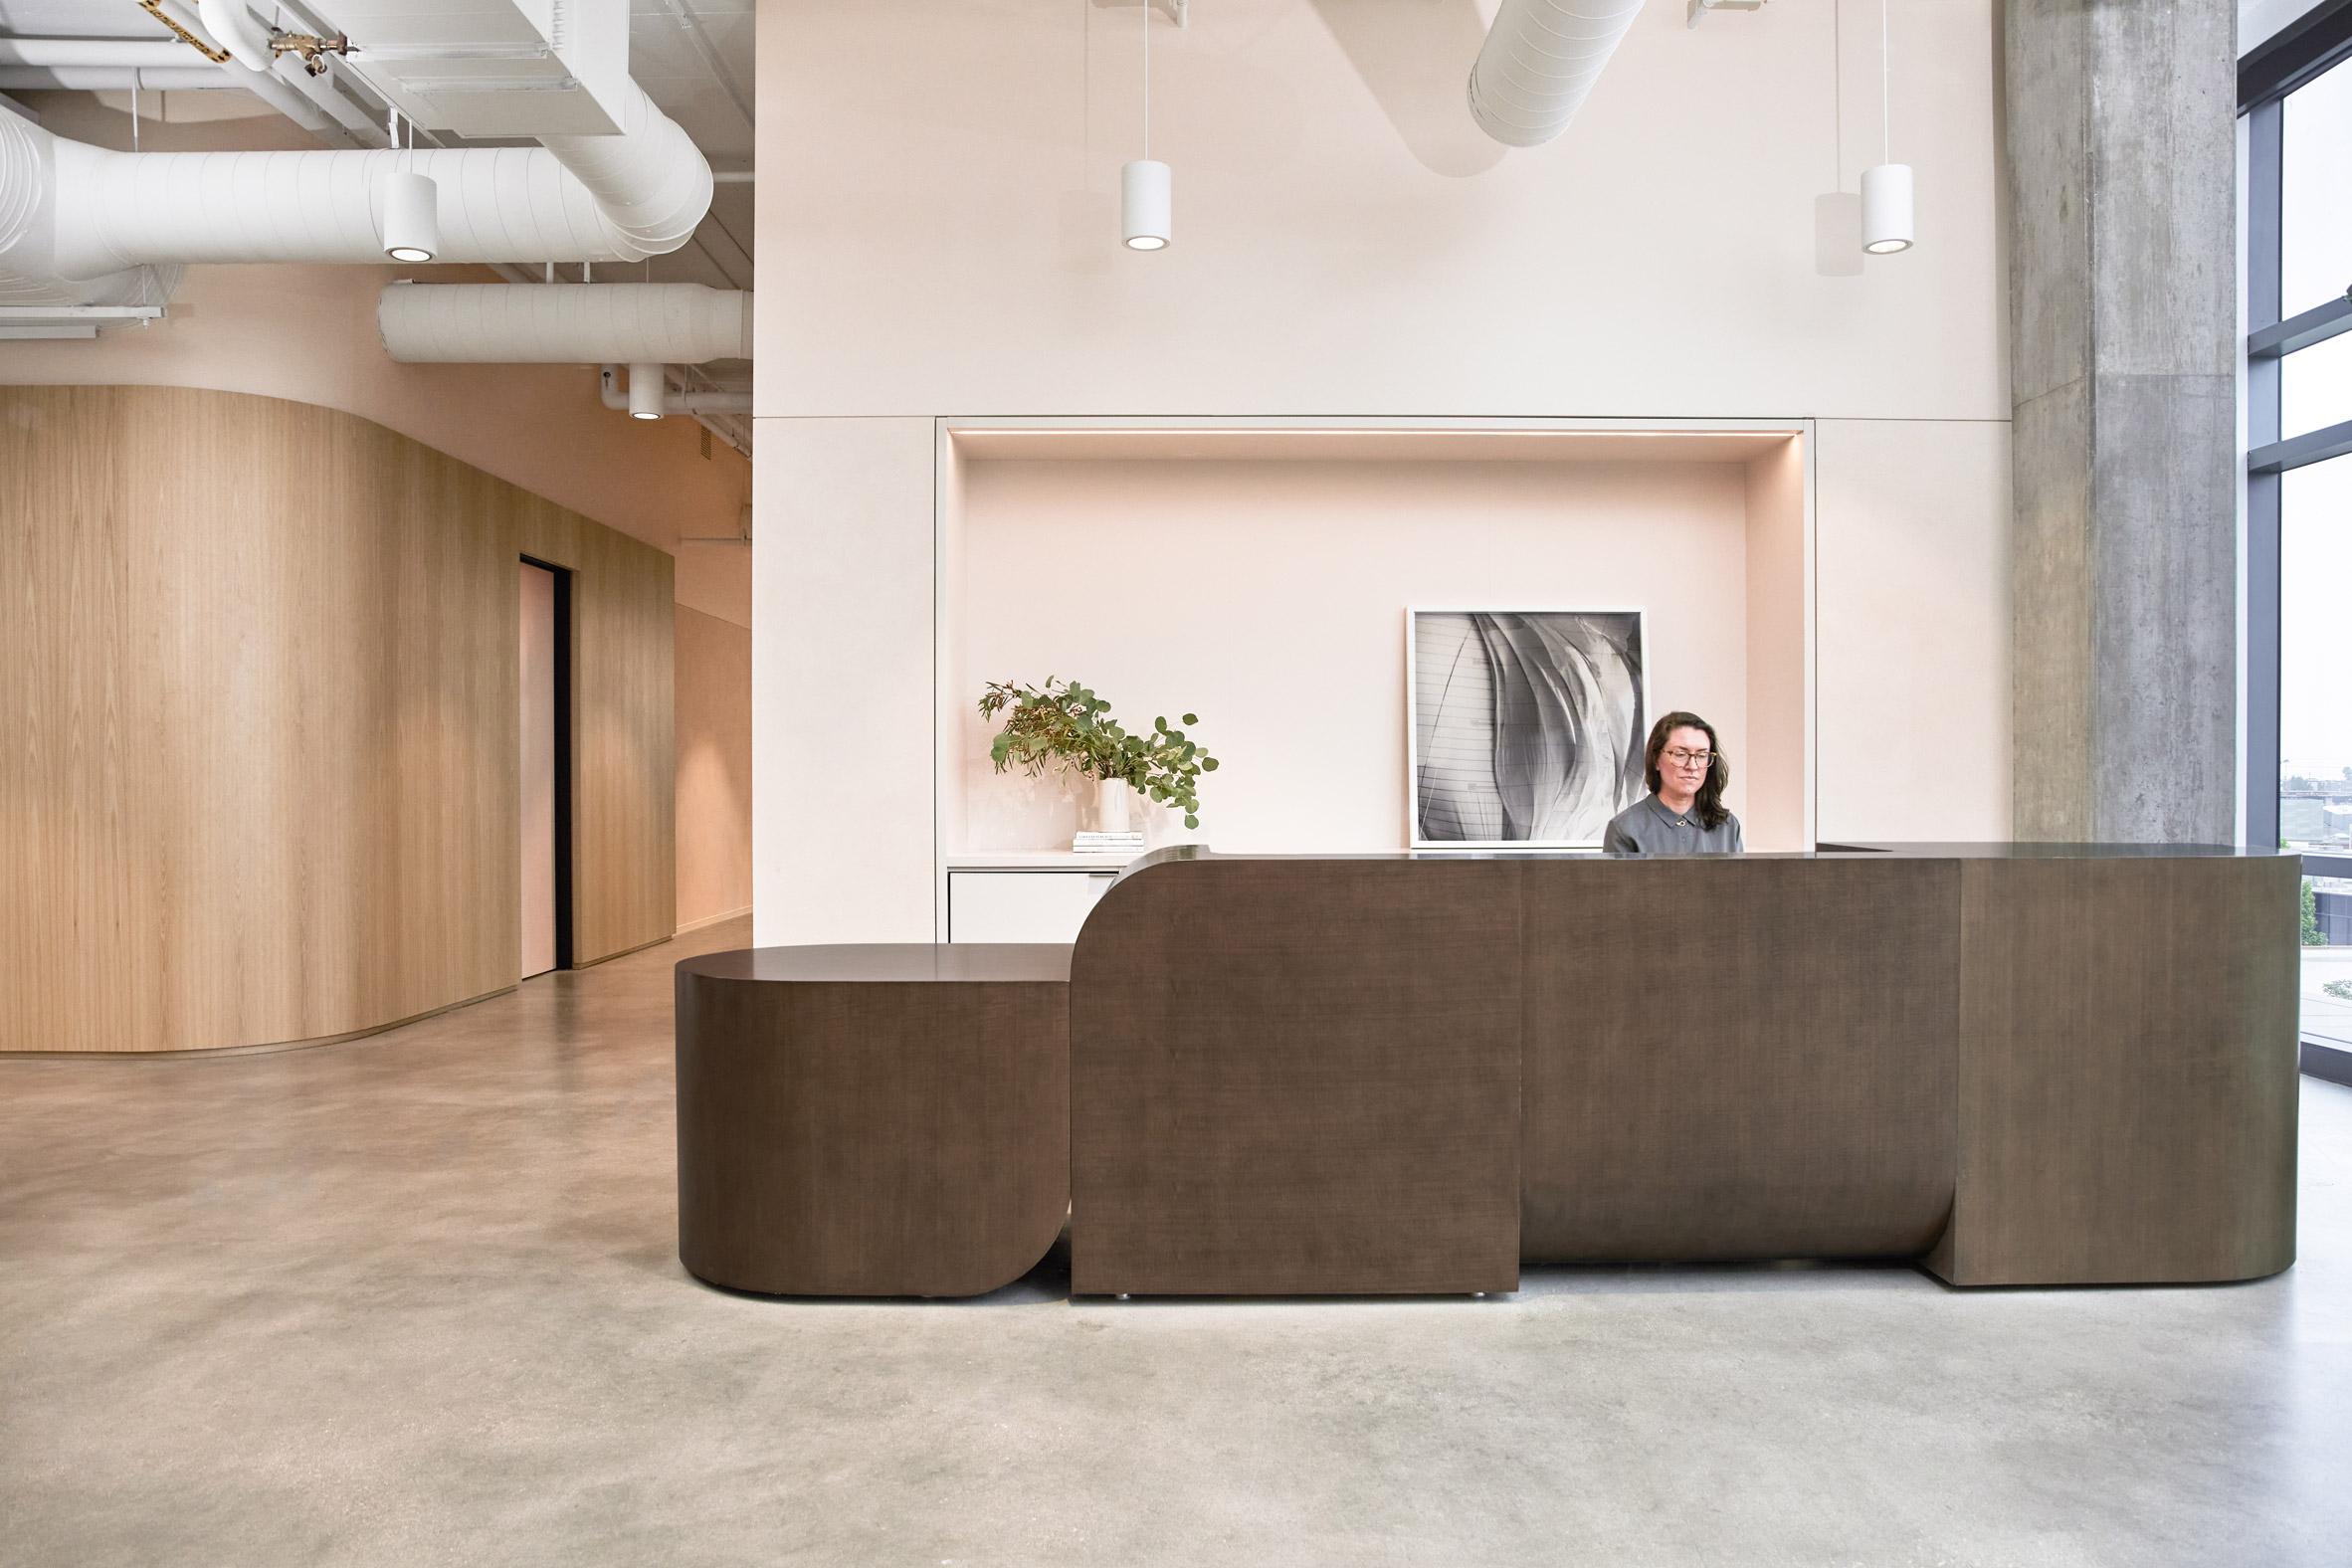 The lobby of Goop's Santa Monica headquarters designed by Rapt Studio